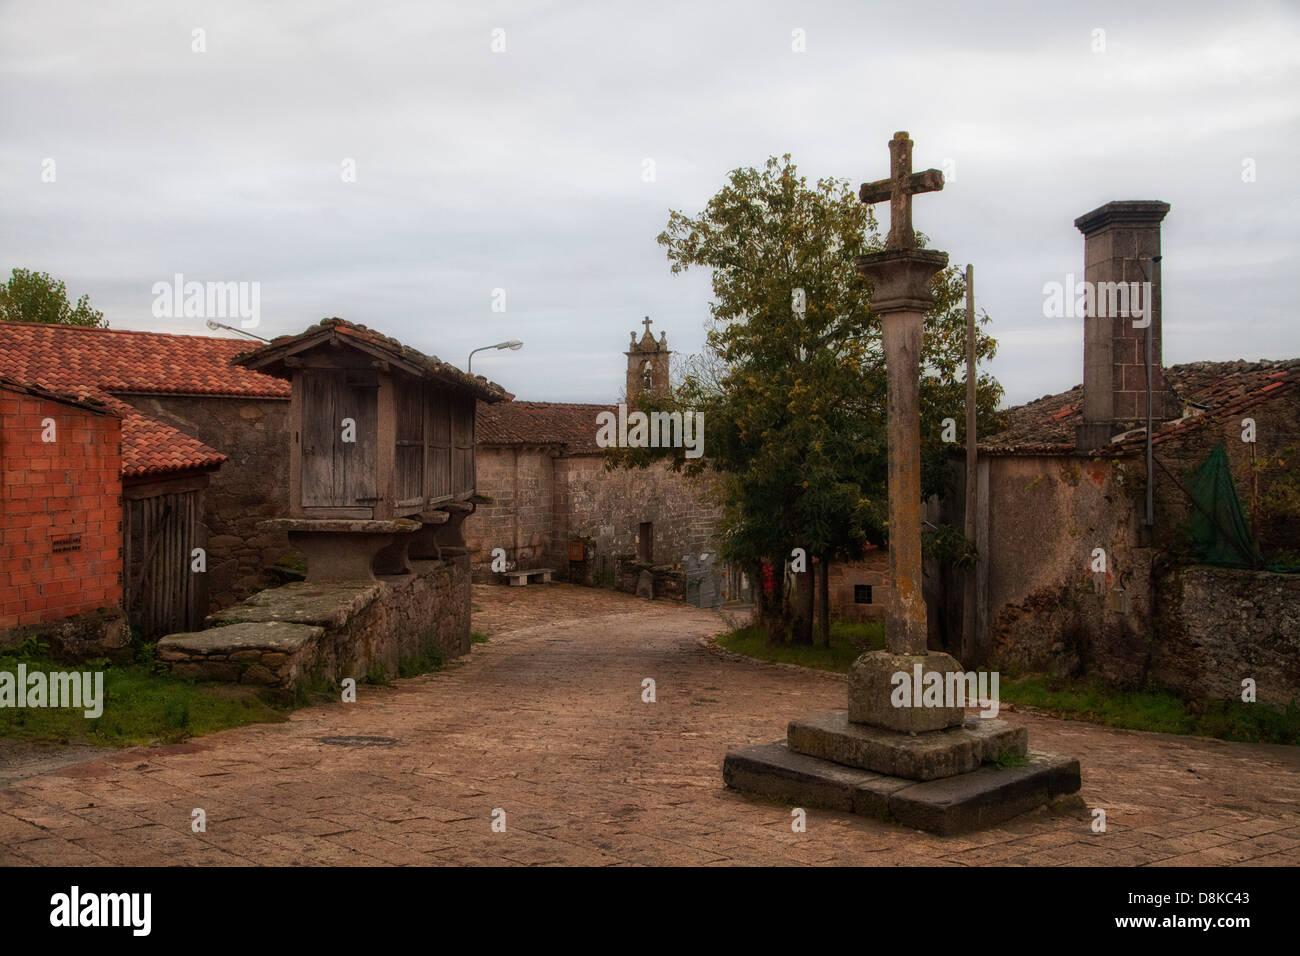 The Camino to Santiago de Compostela, as it passes through the historic plaza of  Gonzar Spain. - Stock Image